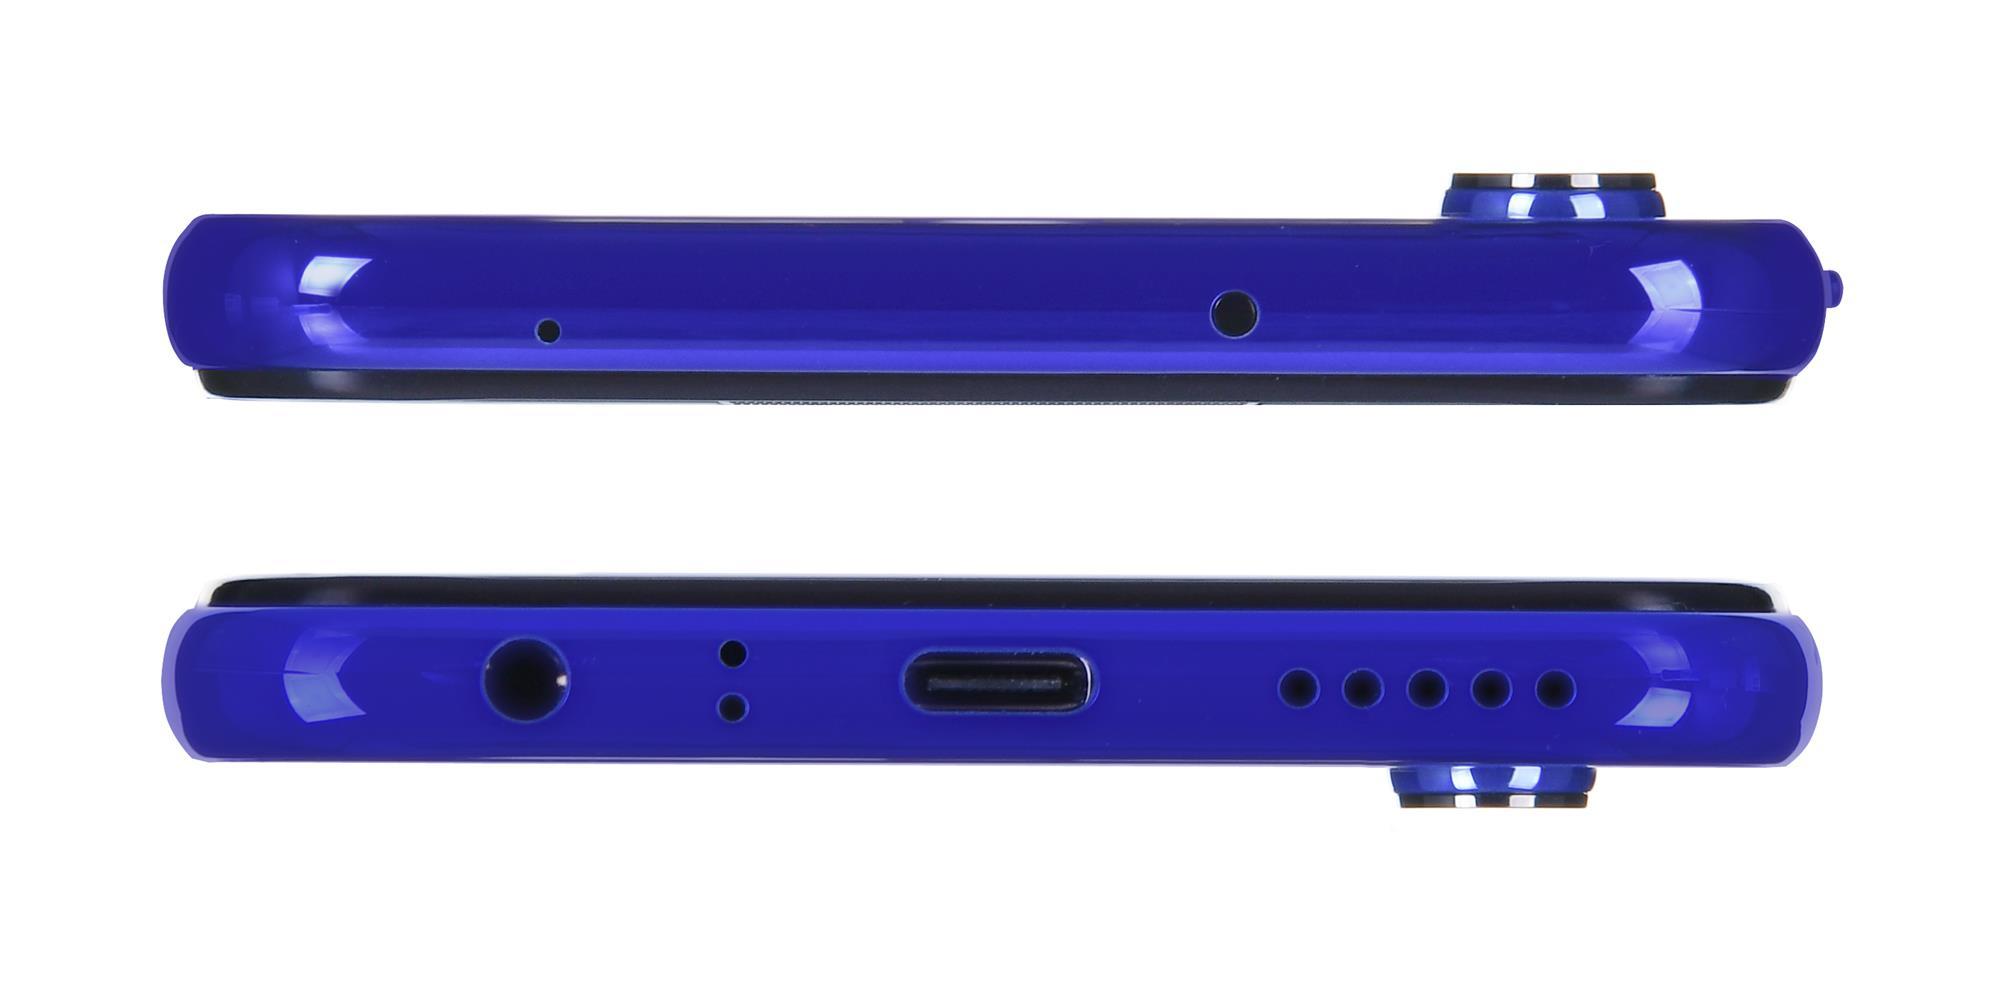 Xiaomi Redmi Note 8T 4GB/128GB Blue Mobilais Telefons